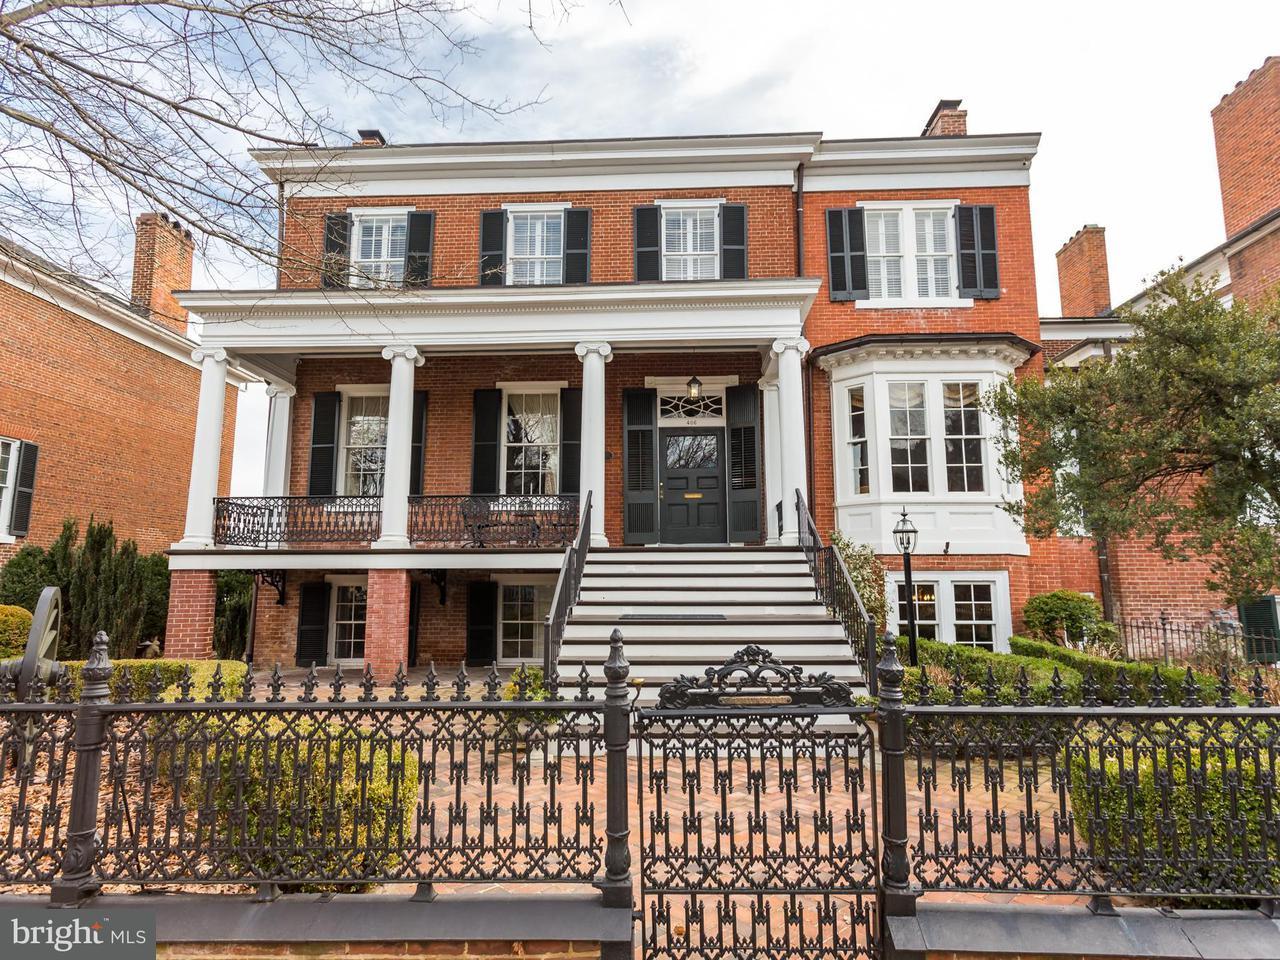 Single Family Home for Sale at 406 Hanover Street 406 Hanover Street Fredericksburg, Virginia 22401 United States